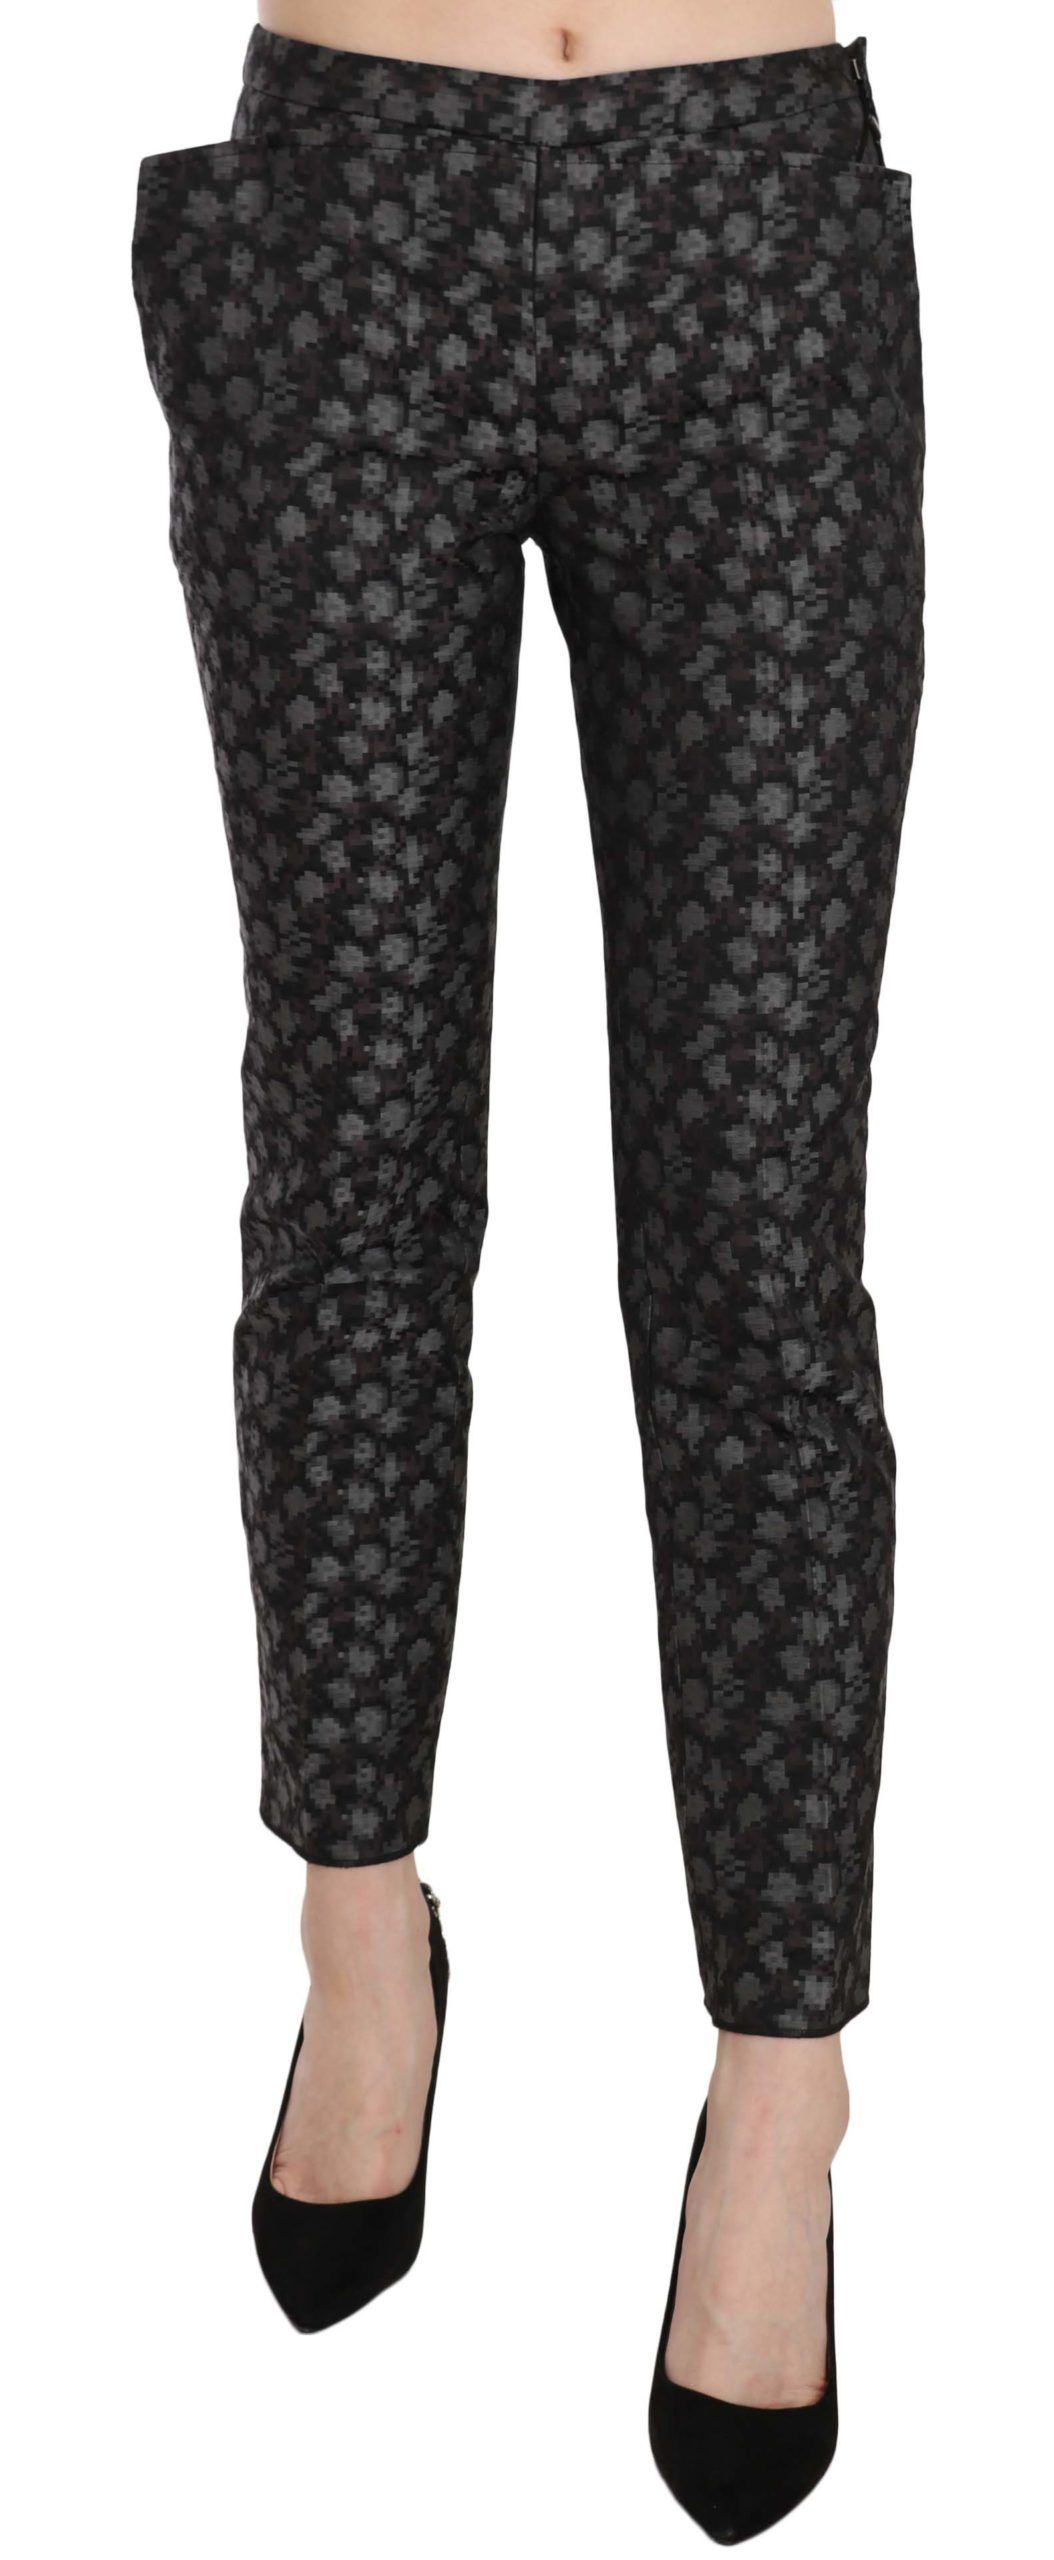 Just Cavalli Black Patterned Low Waist Skinny Trousers Pants